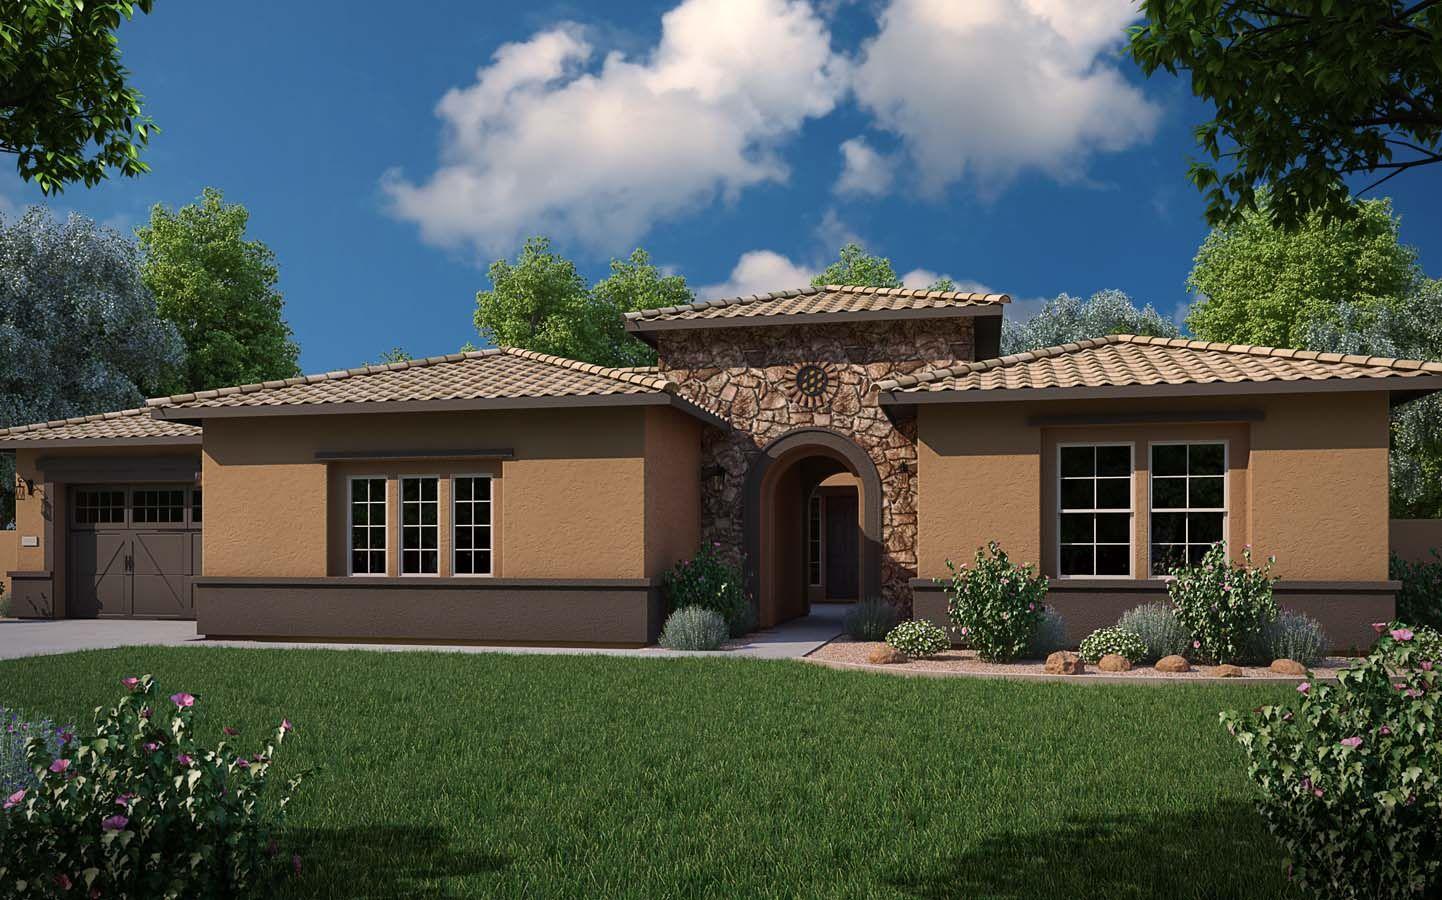 单亲家庭 为 销售 在 Residence 5 23110 N. 76th Ln. Peoria, Arizona 85383 United States